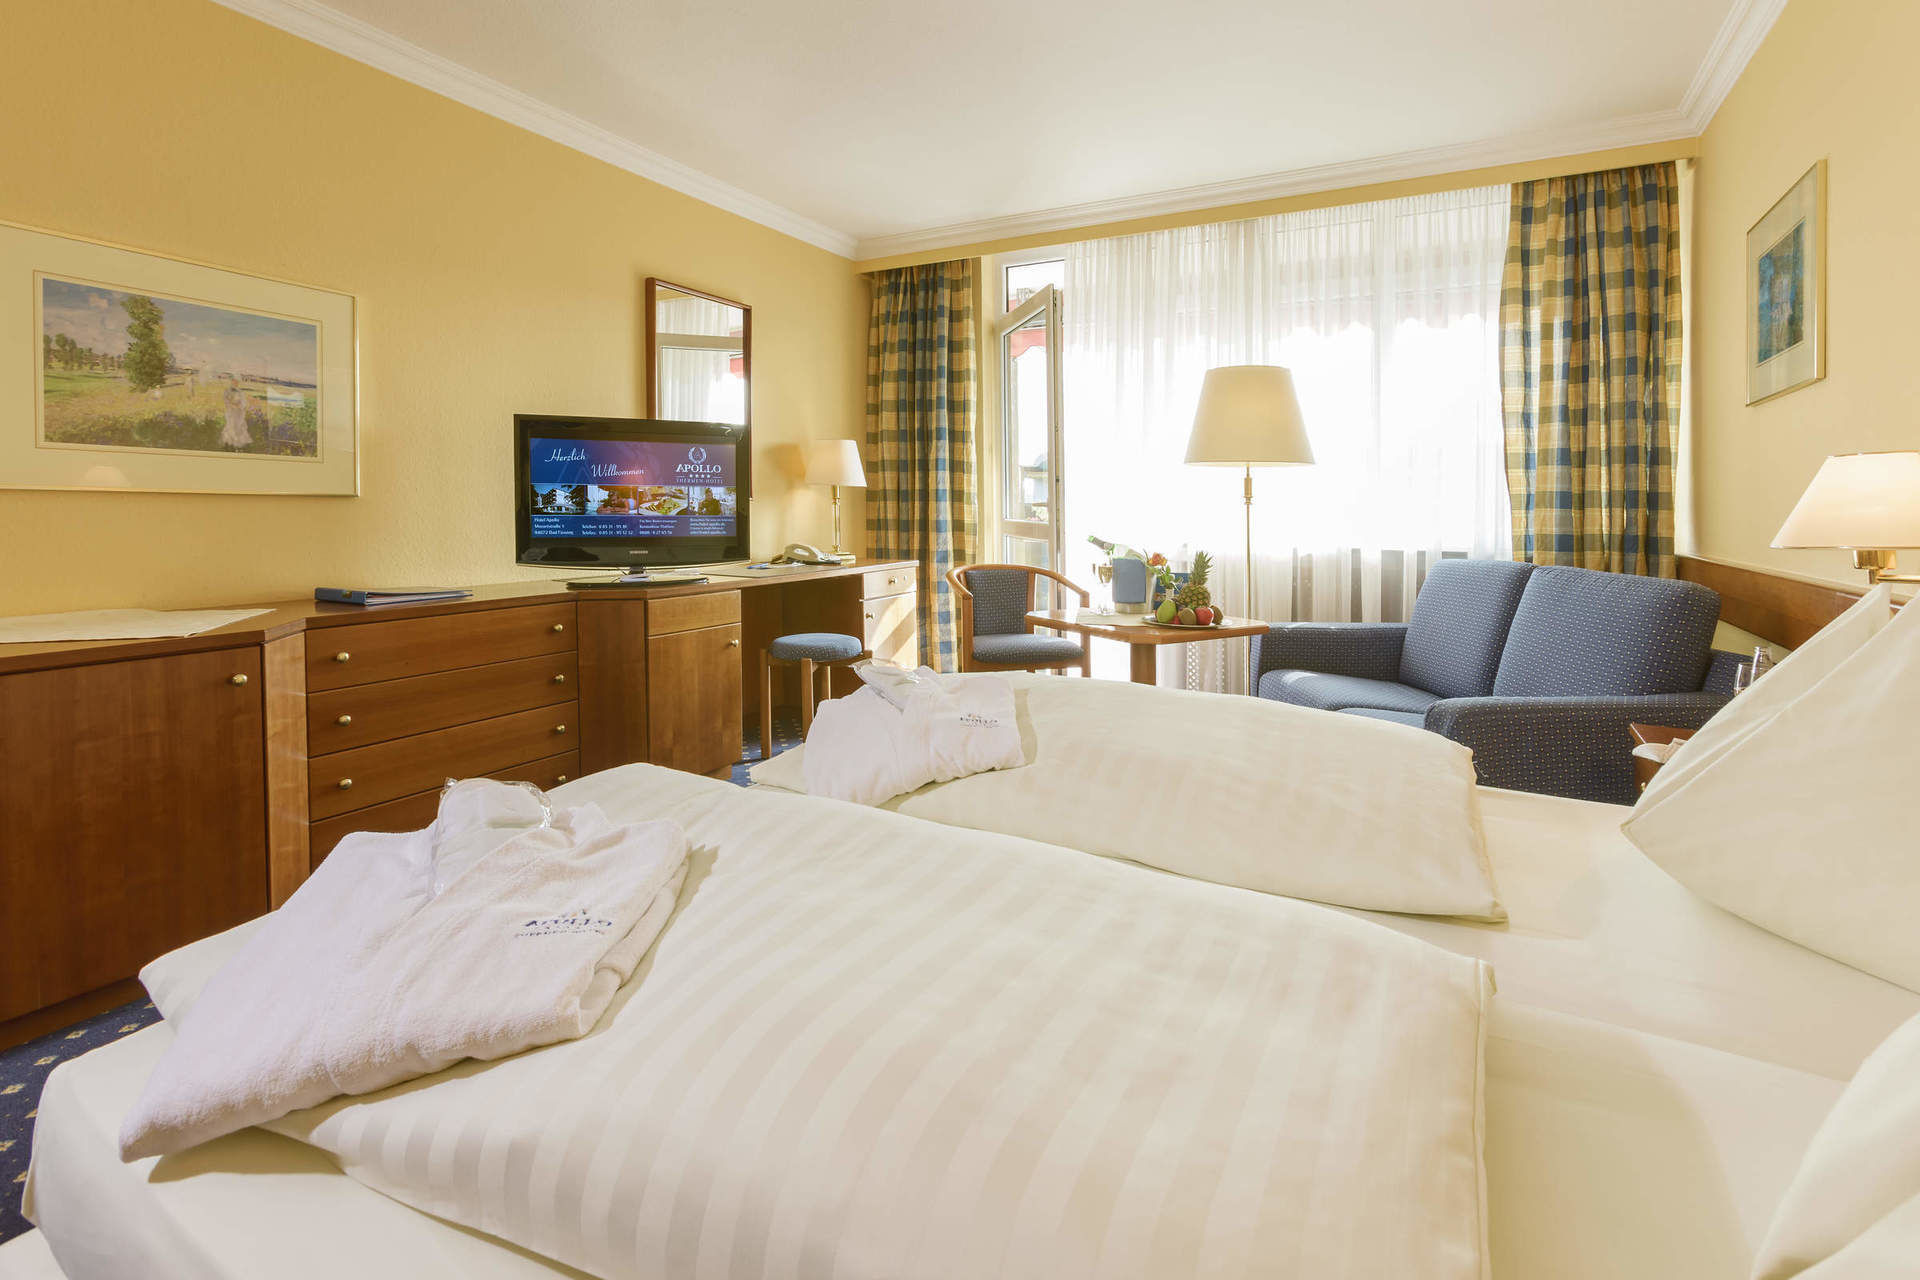 WWW.HOTEL-APOLLO.DE ADVENTSKALENDER